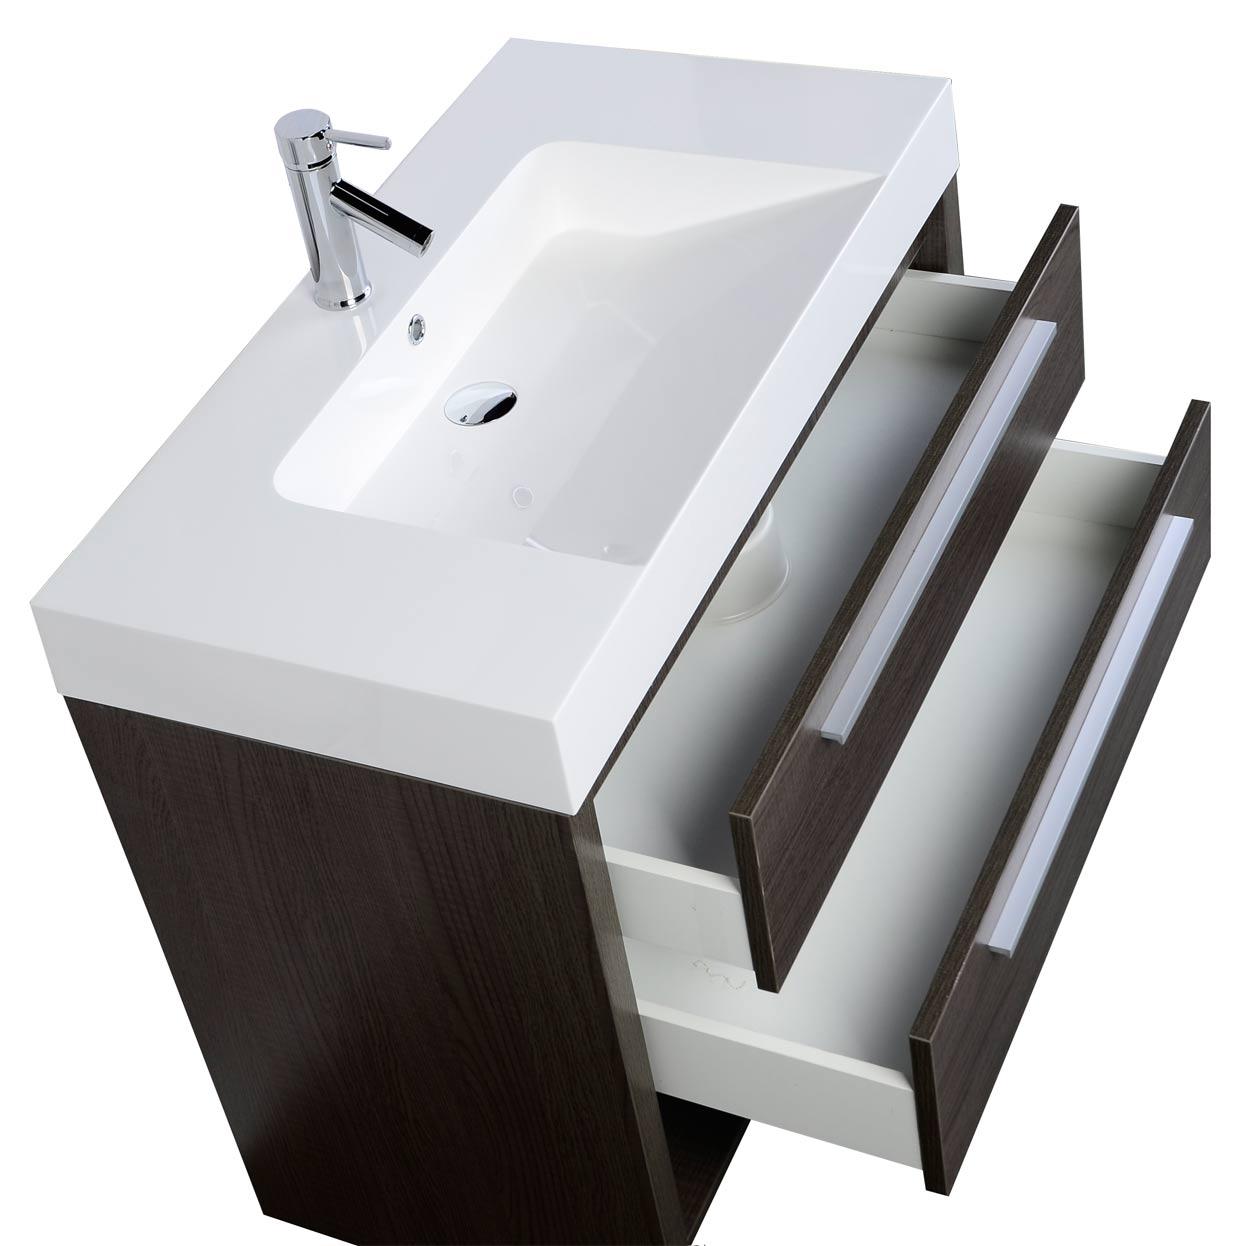 Bathroom vanities syracuse ny - Download